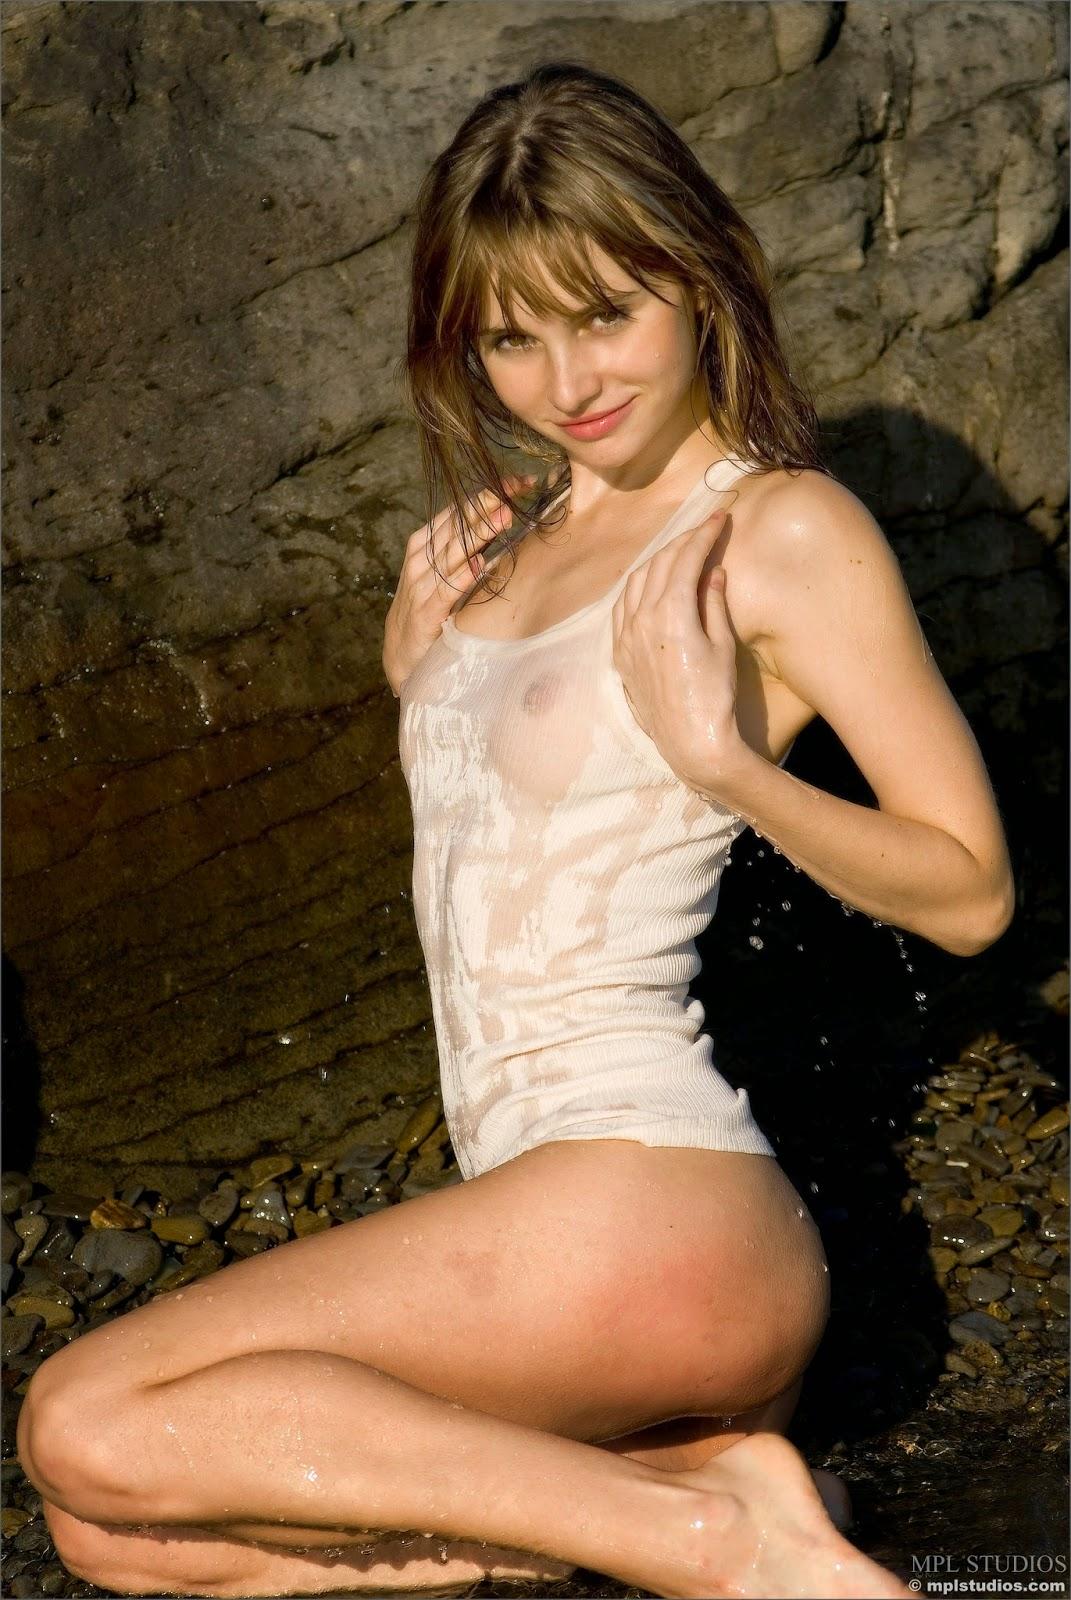 http://2.bp.blogspot.com/-BIwkbwfTW5Y/VPX_ECd9VjI/AAAAAAAAJ00/RBpy58xHgDA/s1600/4450037.jpg